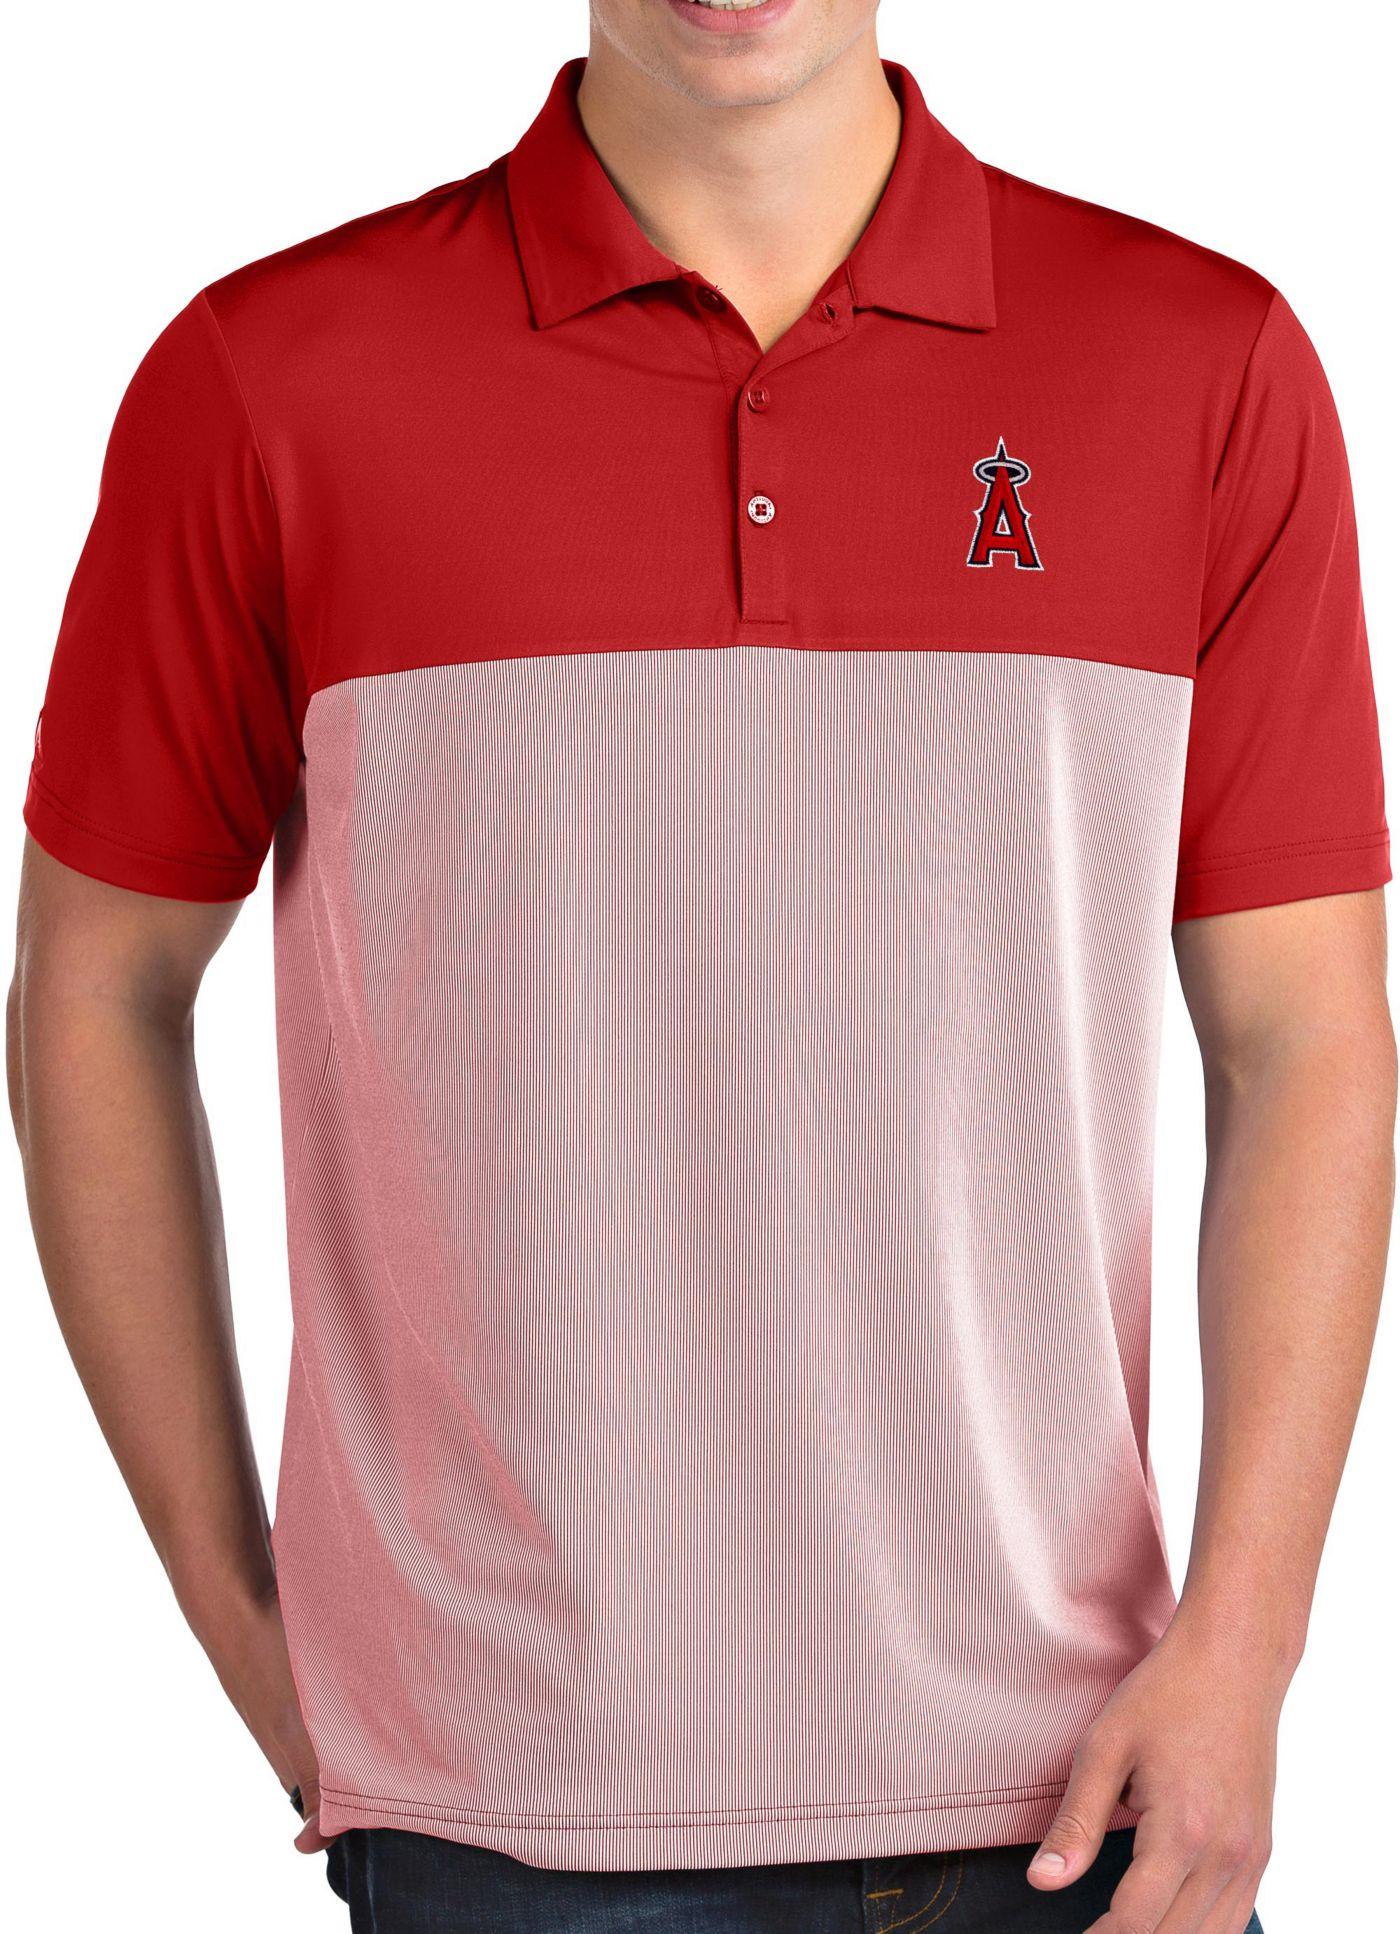 Antigua Men's Los Angeles Angels Venture Red Performance Polo